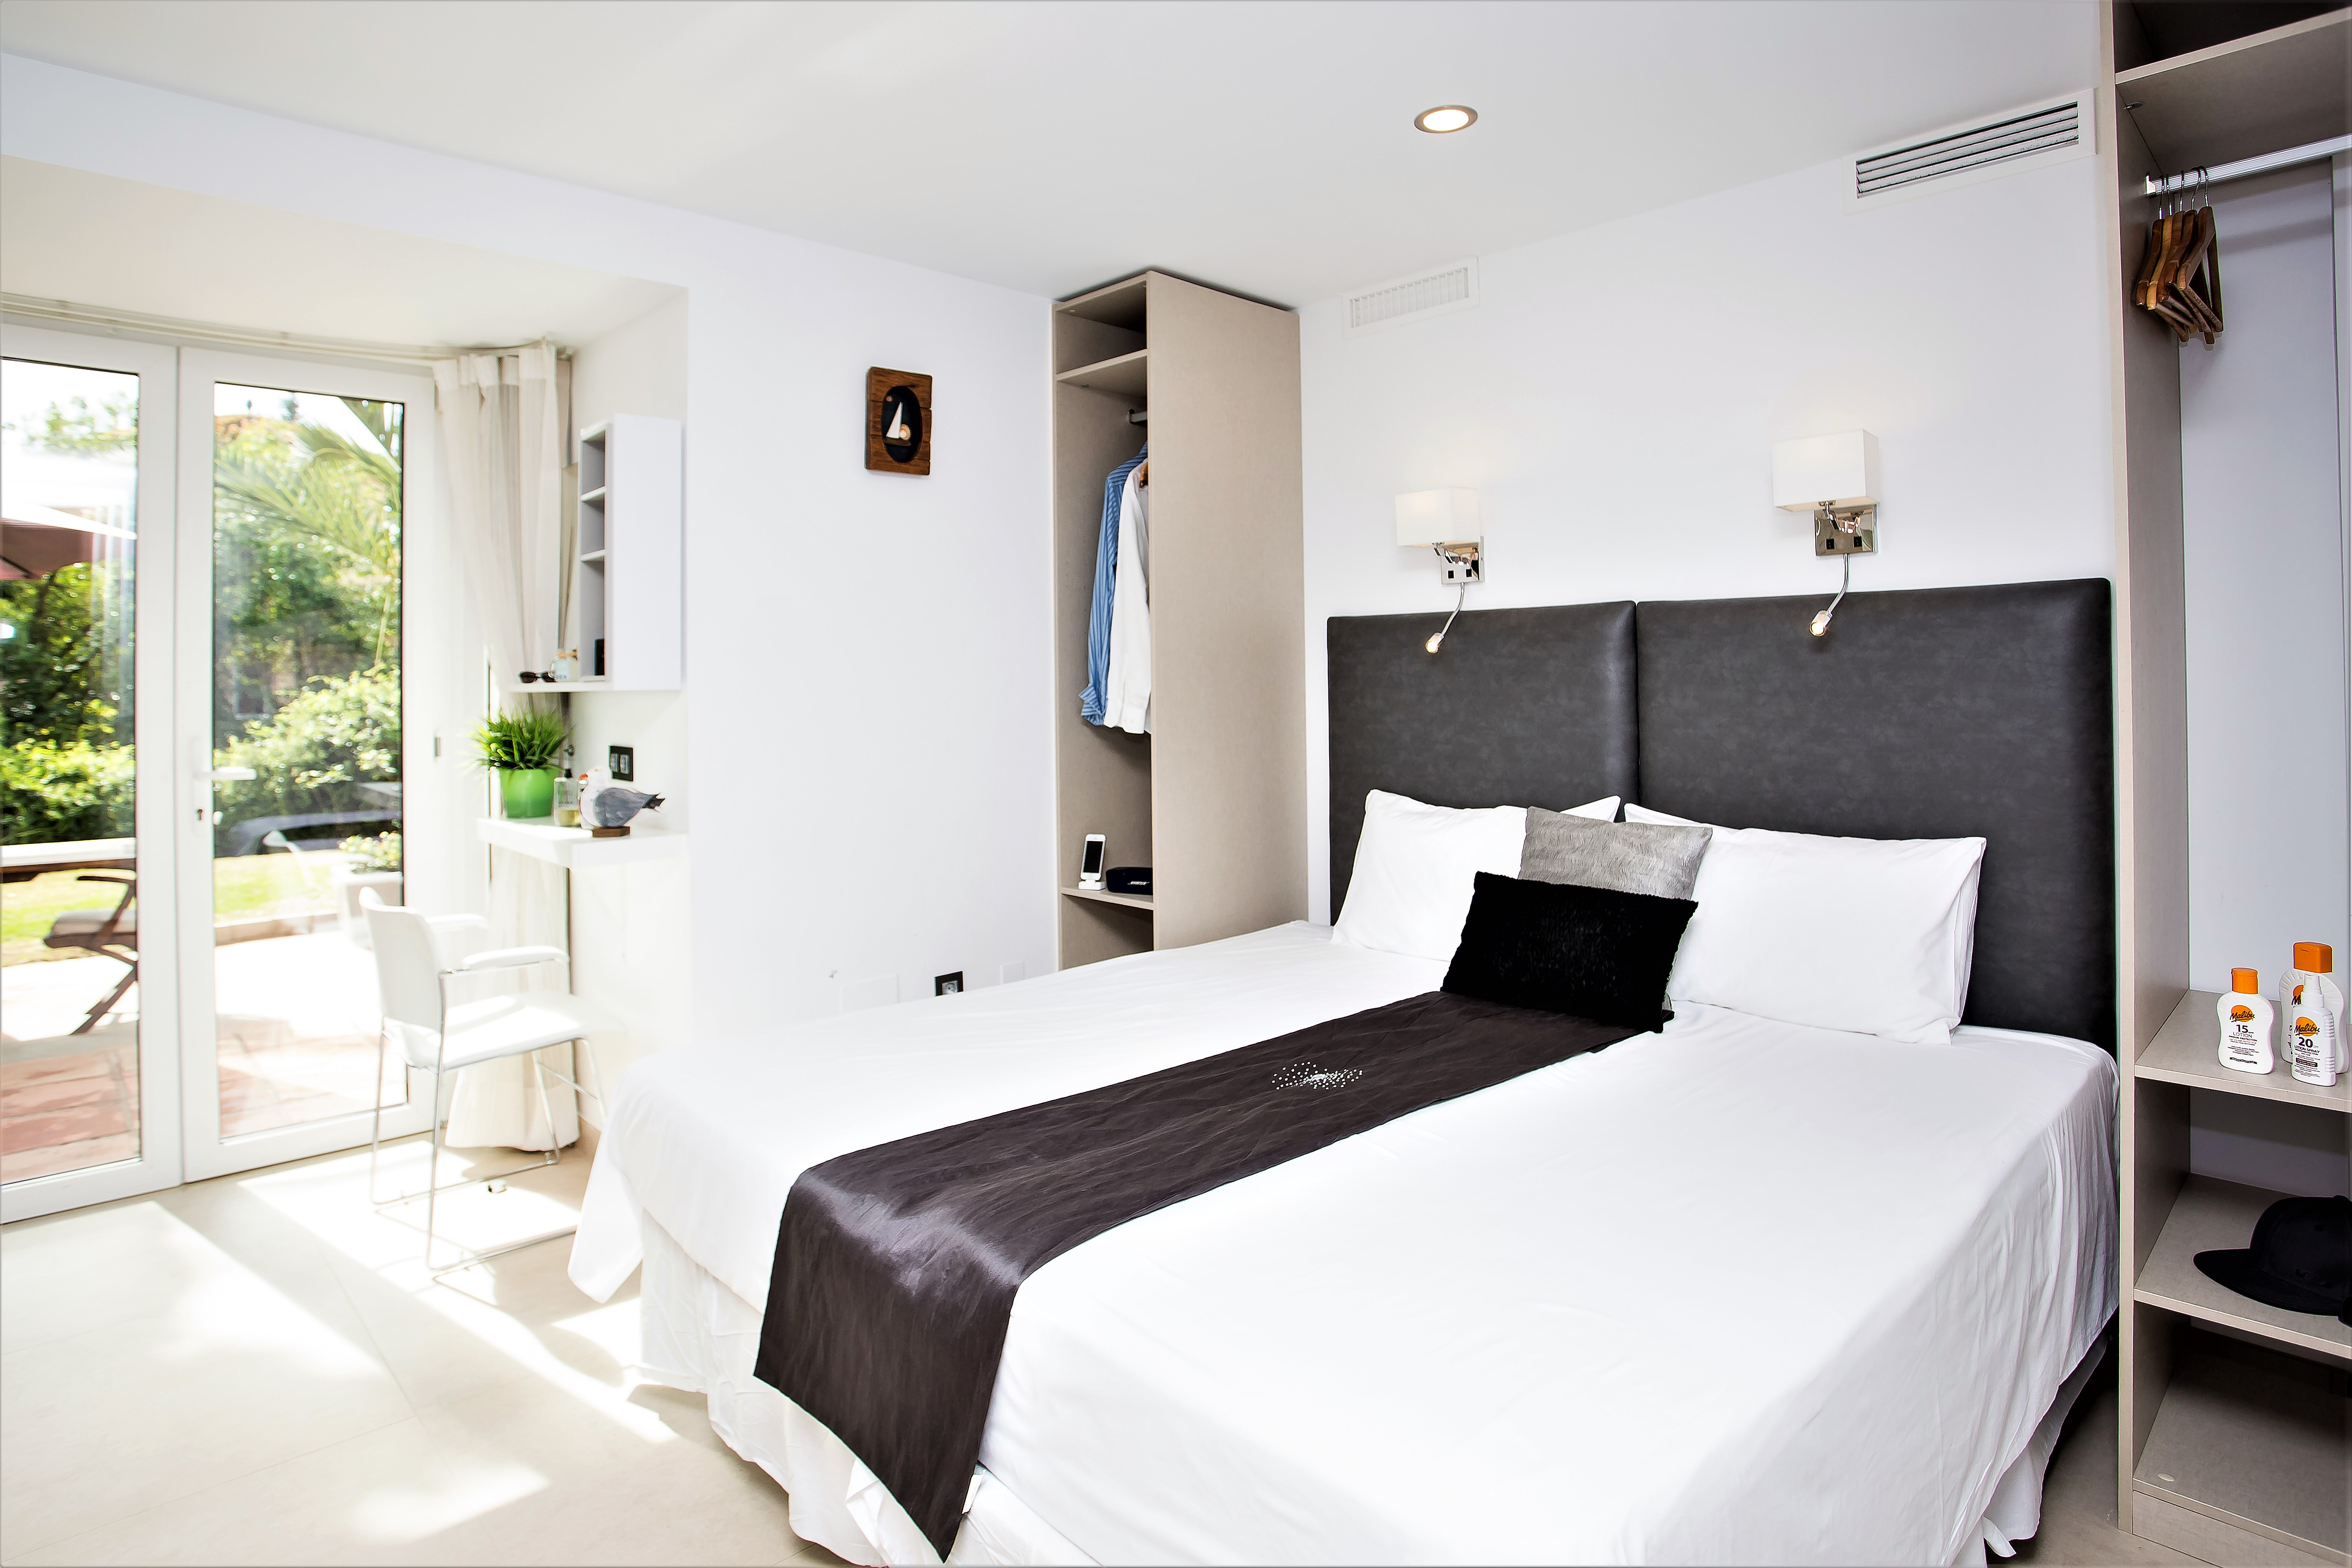 Apartment 5 B R VILLA BY PUERTO BANUS   SEA 5min                                photo 20281246